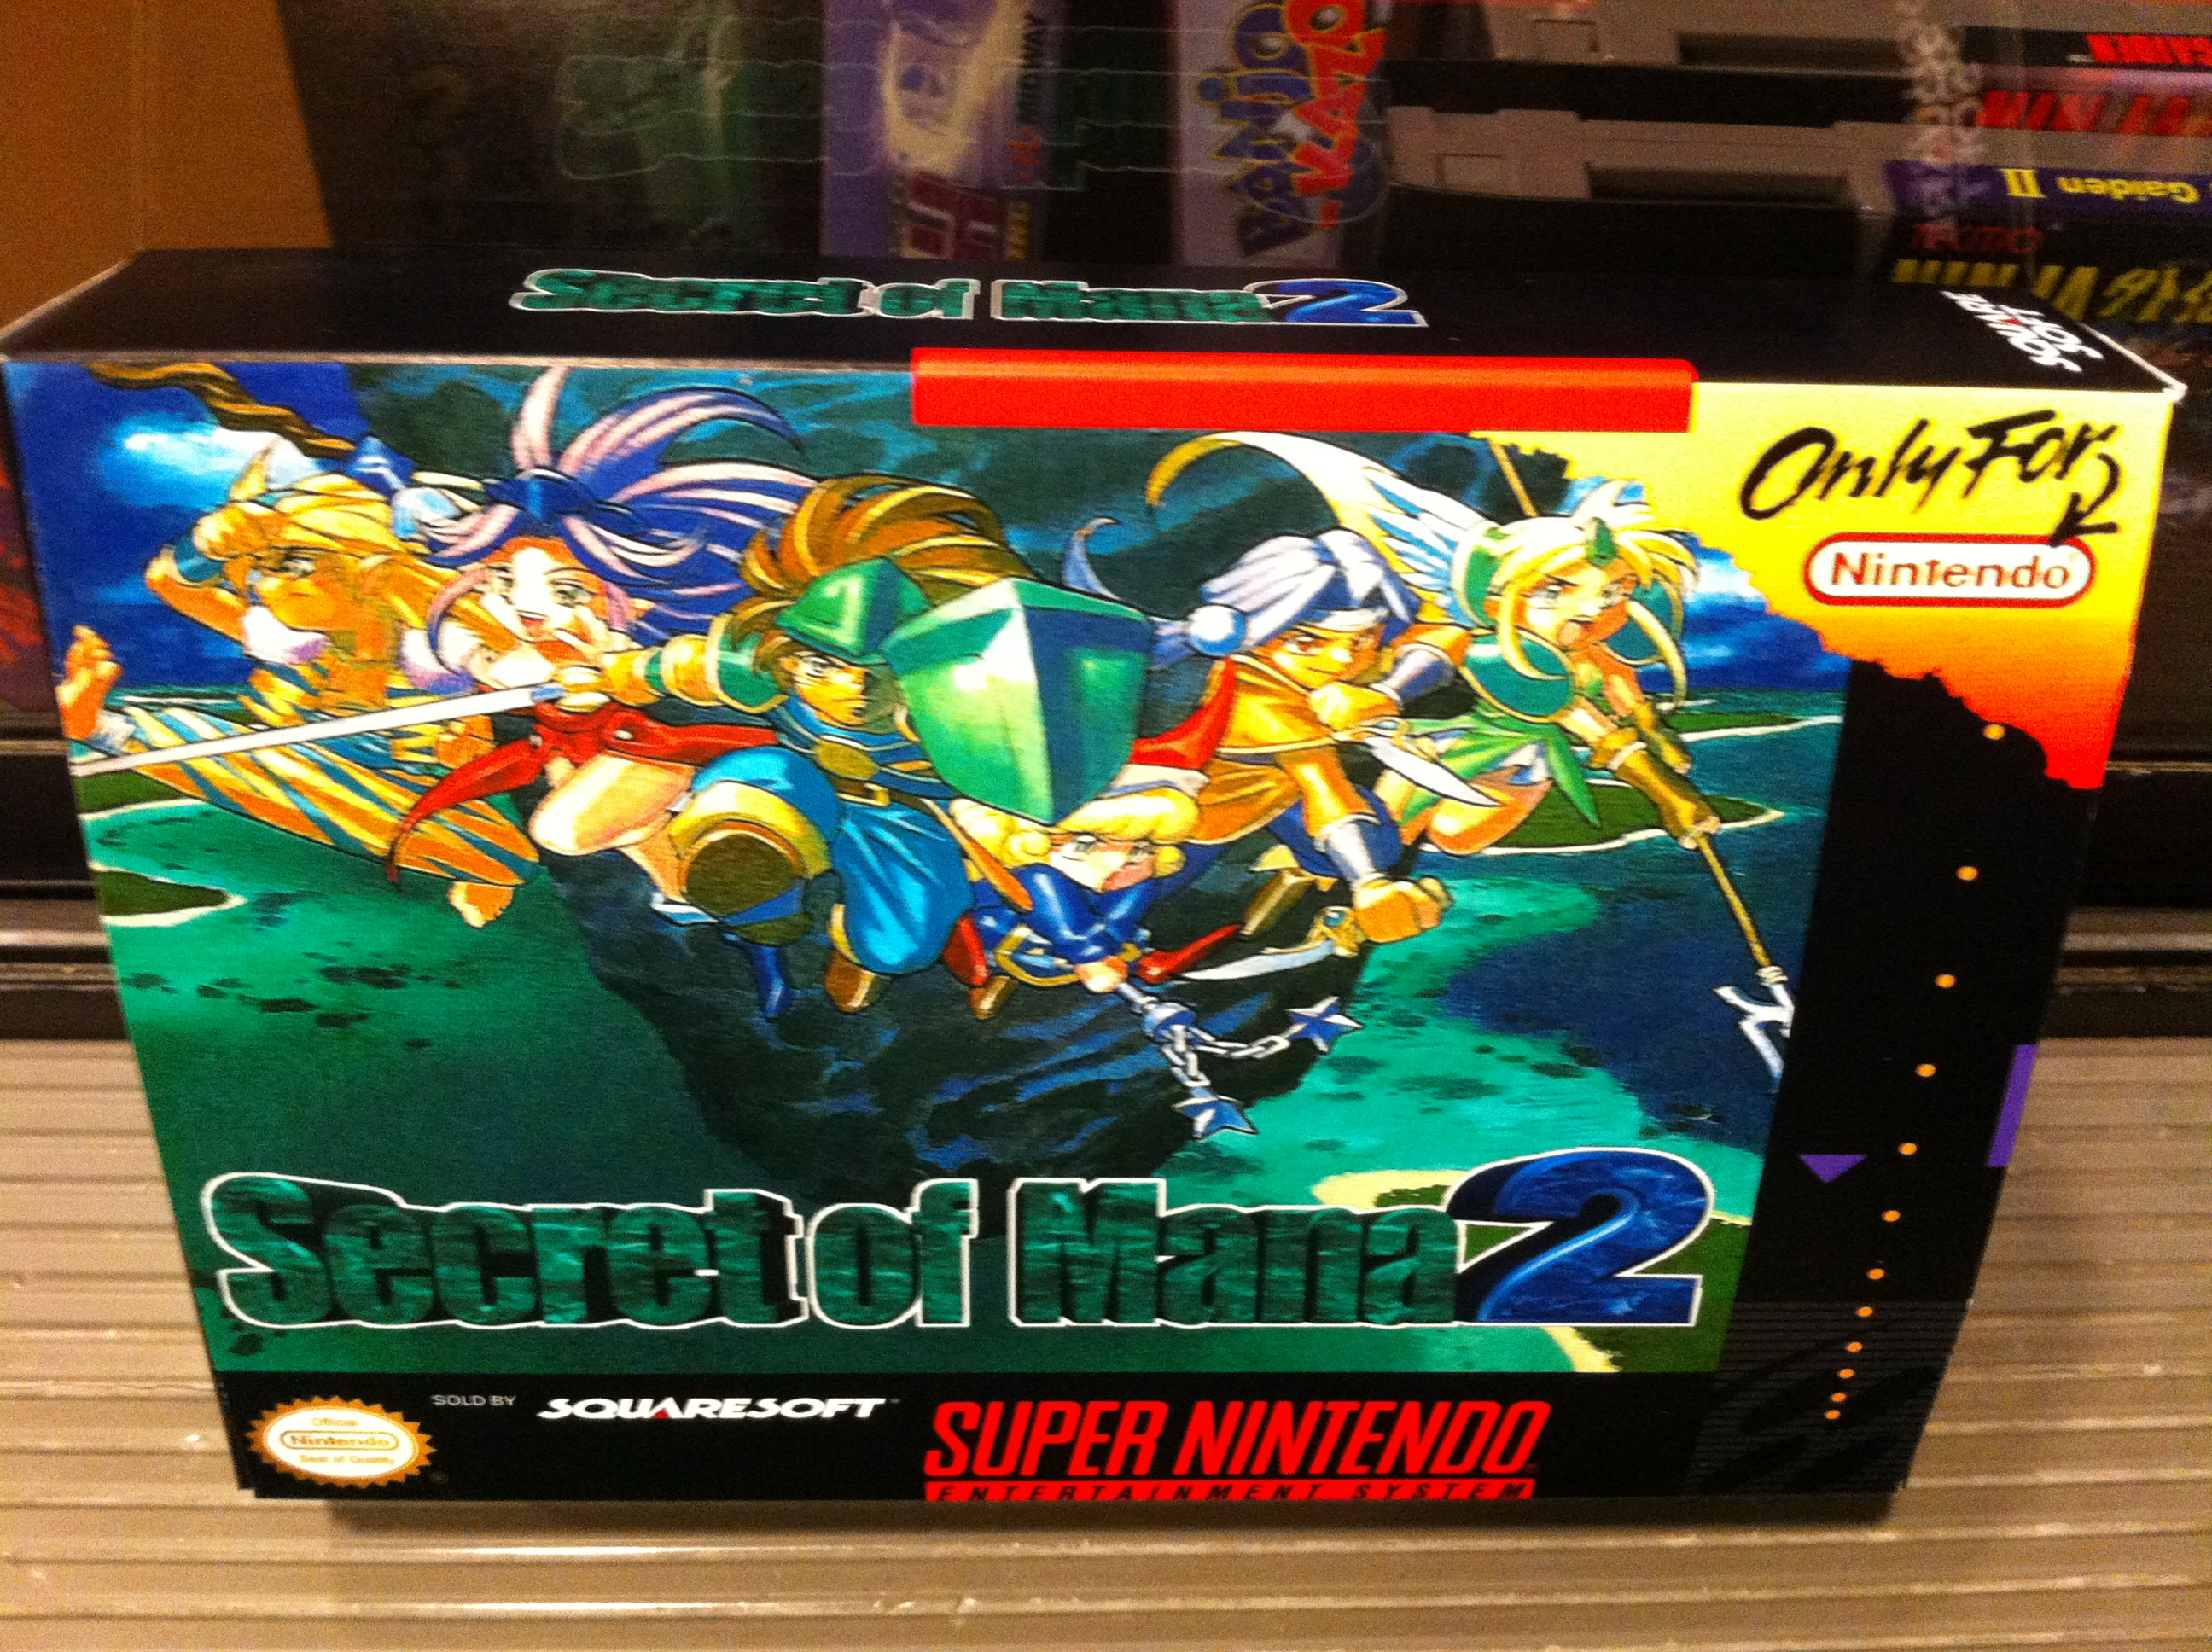 Secret of Mana 2 Box for the unreleased Super Nintendo NA ...